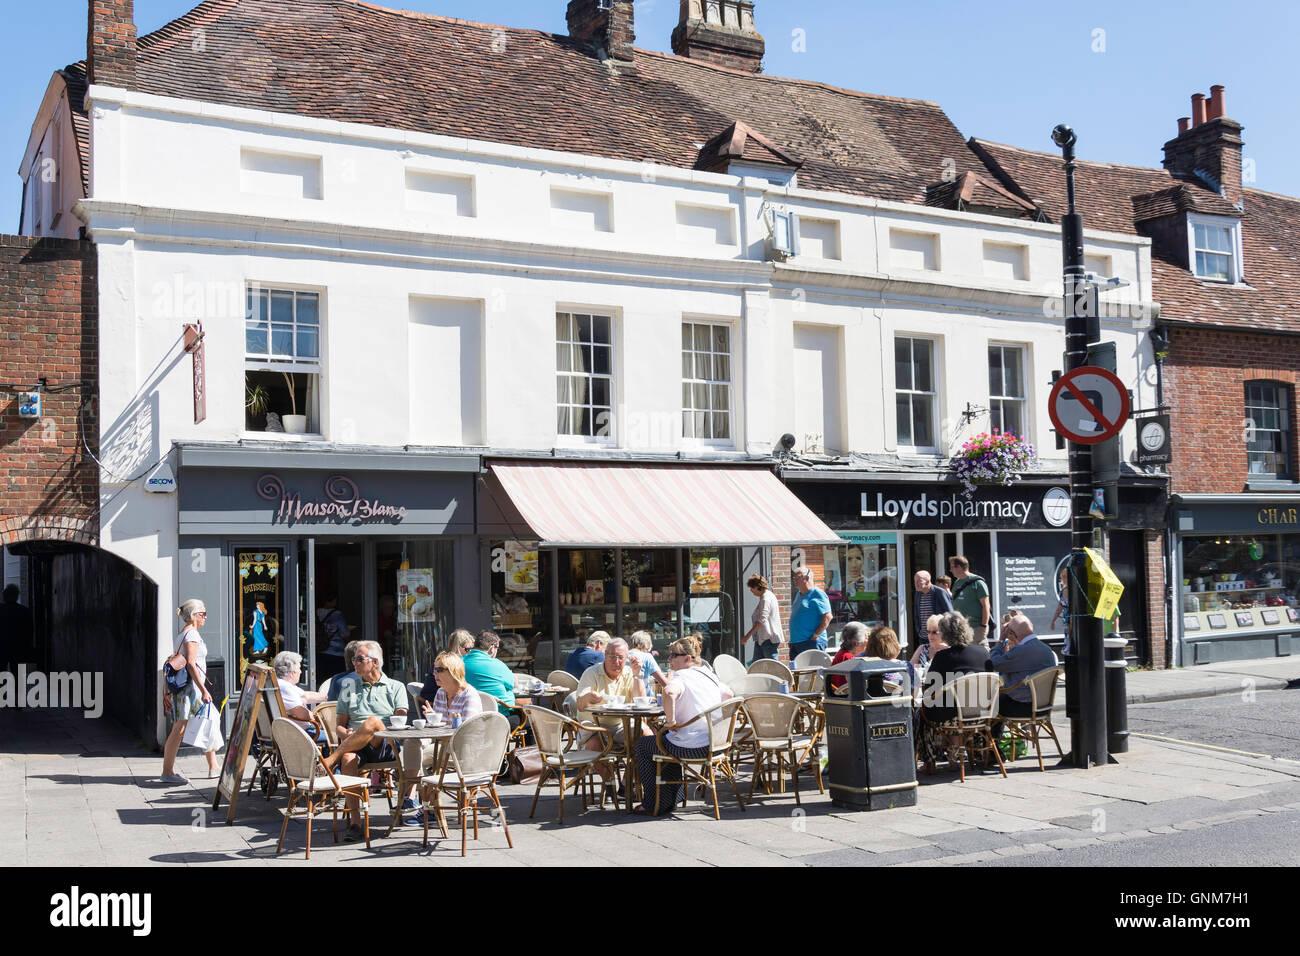 Maison Blanc Patisserie, High Street, Winchester, Hampshire, England, United Kingdom - Stock Image